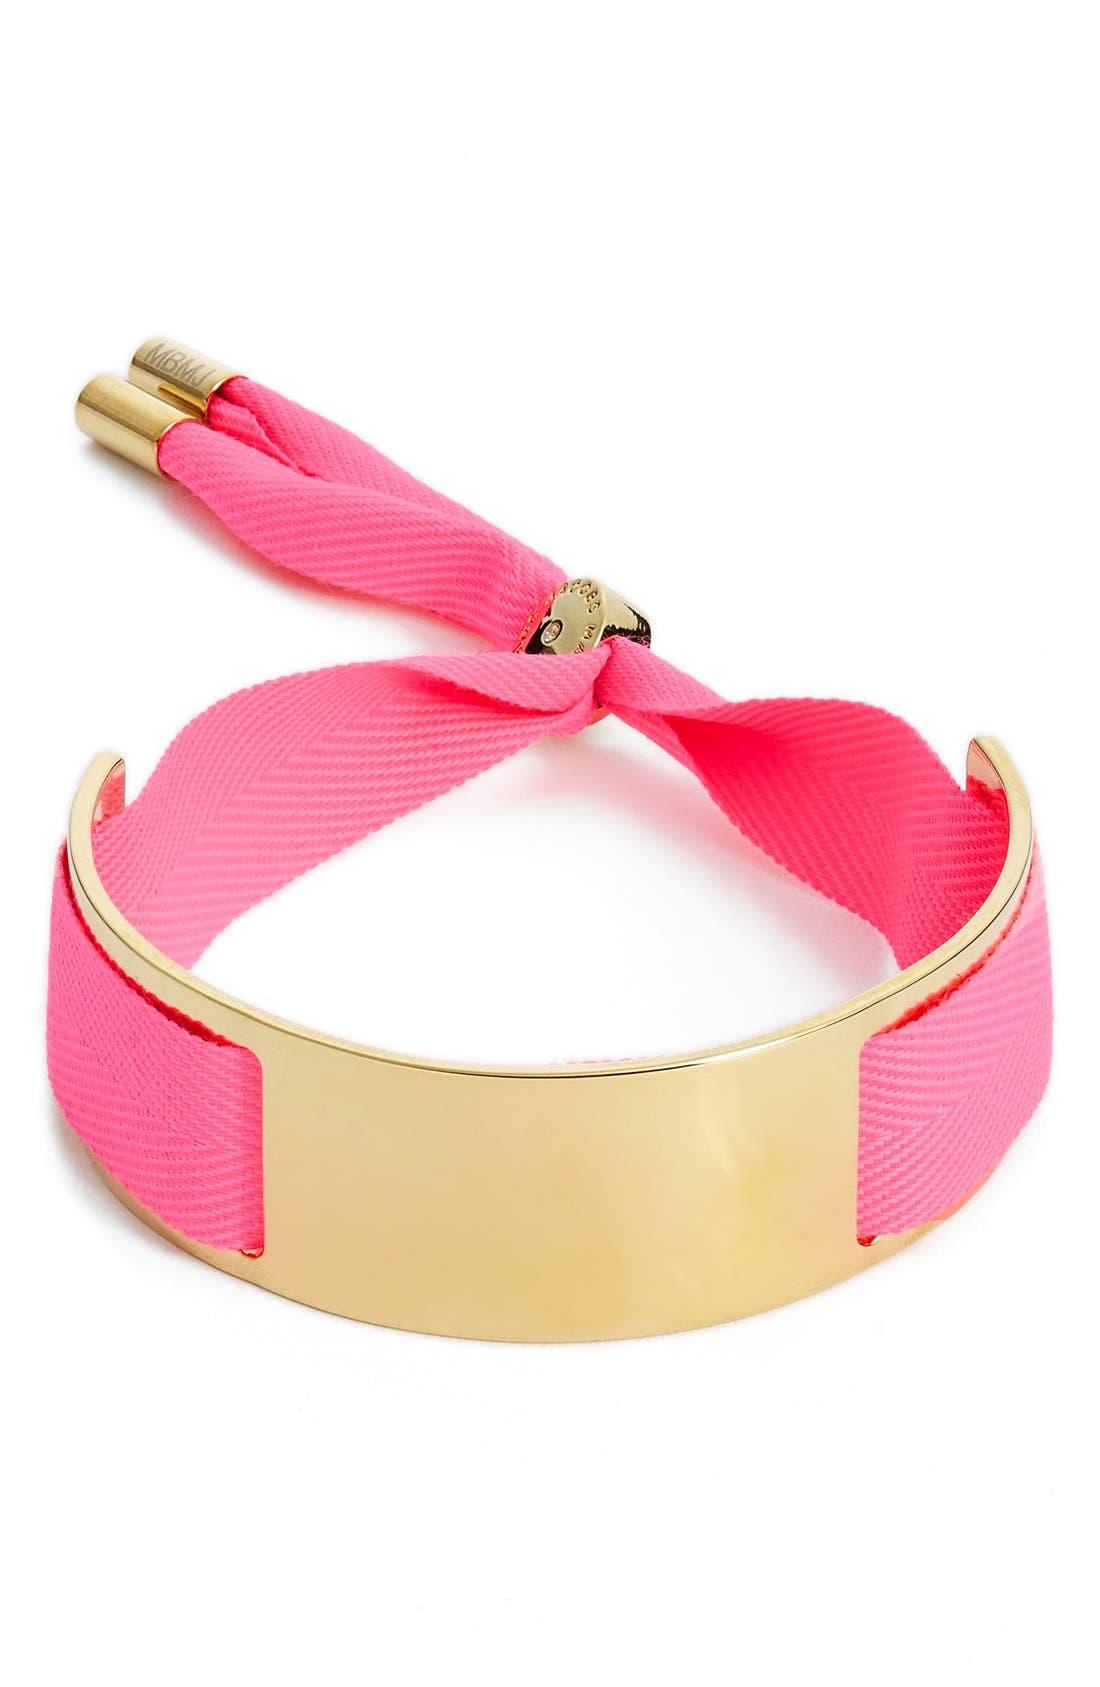 Ribbon Friendship Bracelet,                         Main,                         color, Knock Out Pink